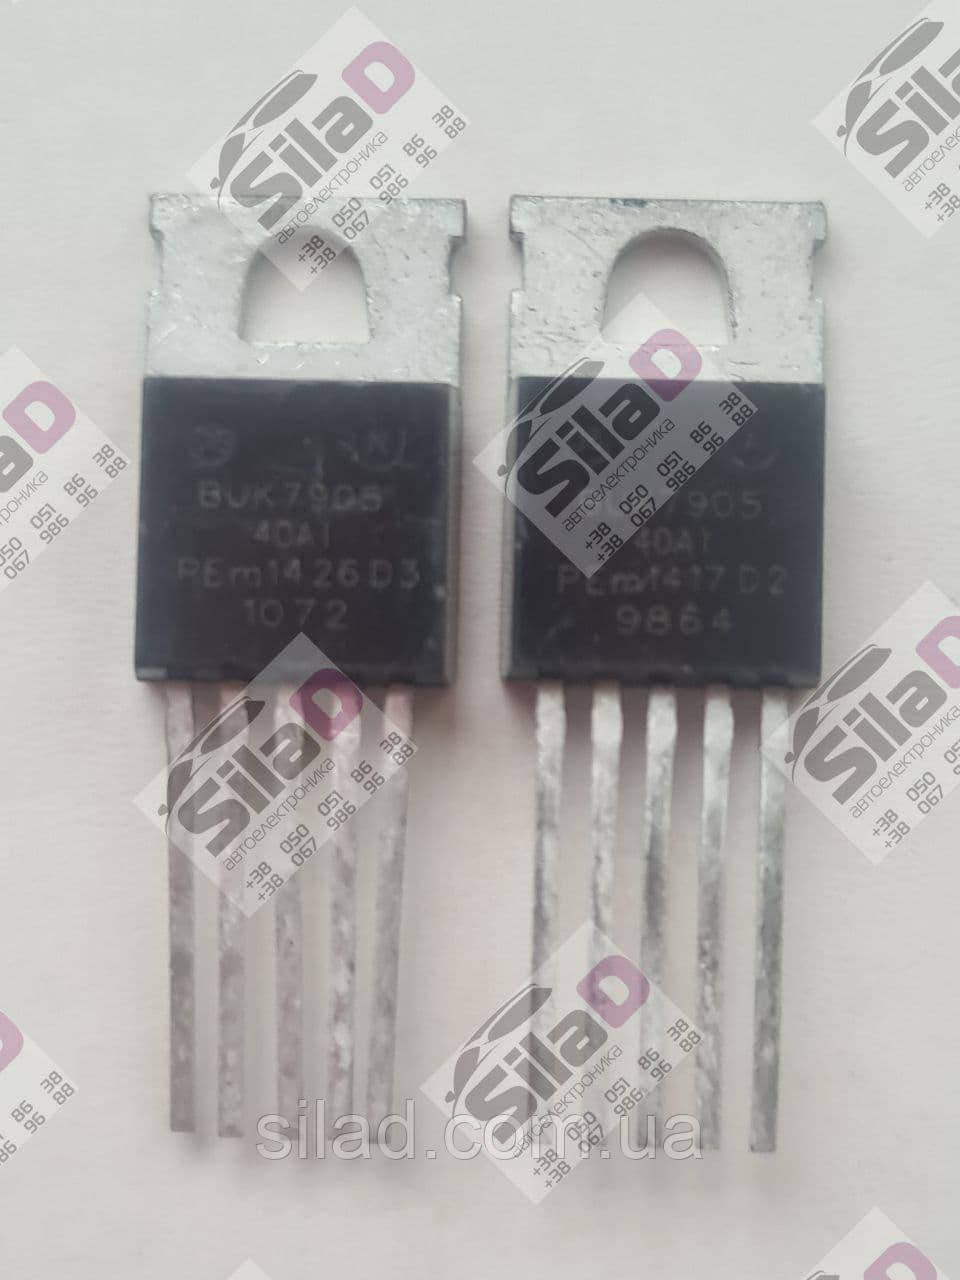 Транзистор BUK7905-40AI NXP Semiconductors корпус TO220